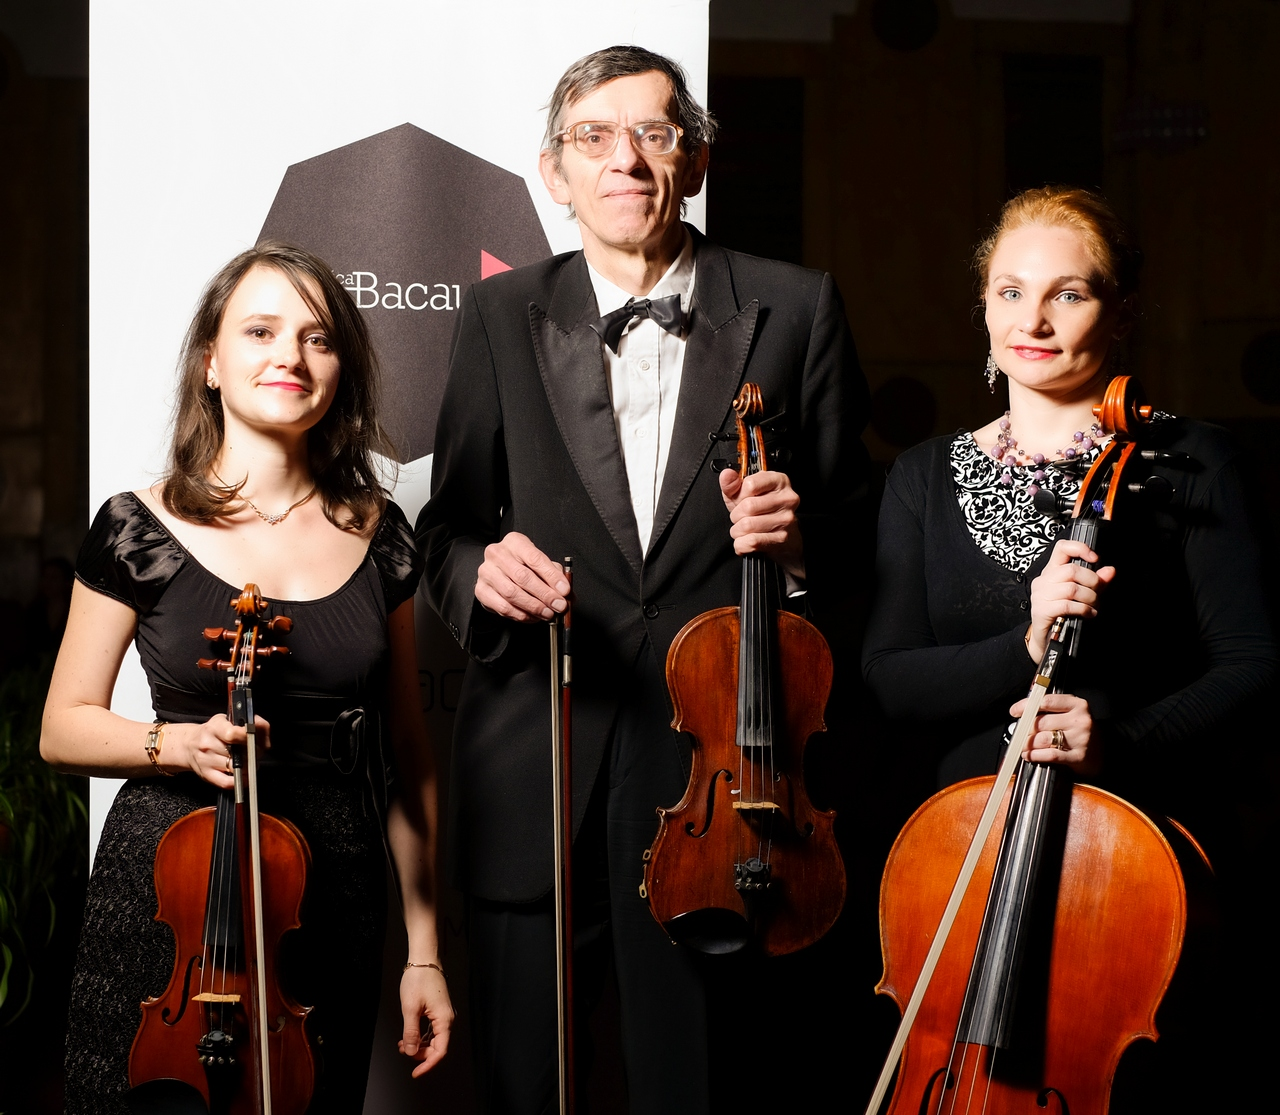 Filarmonica Mihail Jora Bacau - Formatii camerale - Trio Ateneu